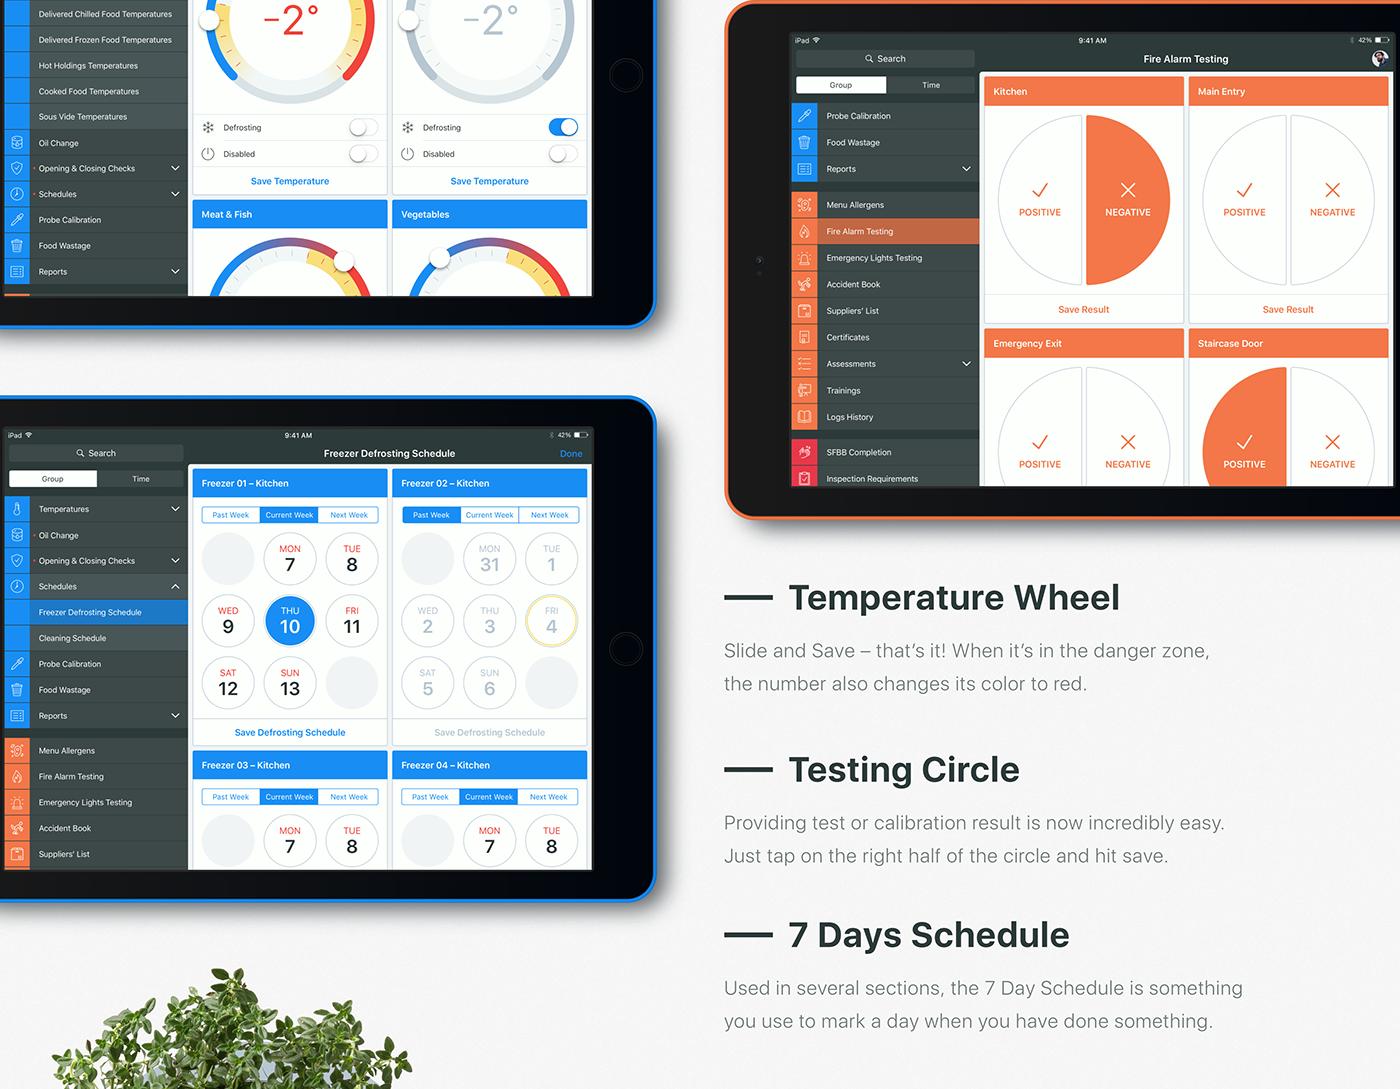 restaurant Food  app iPad Health & Safety ios eco friendly UI user interface